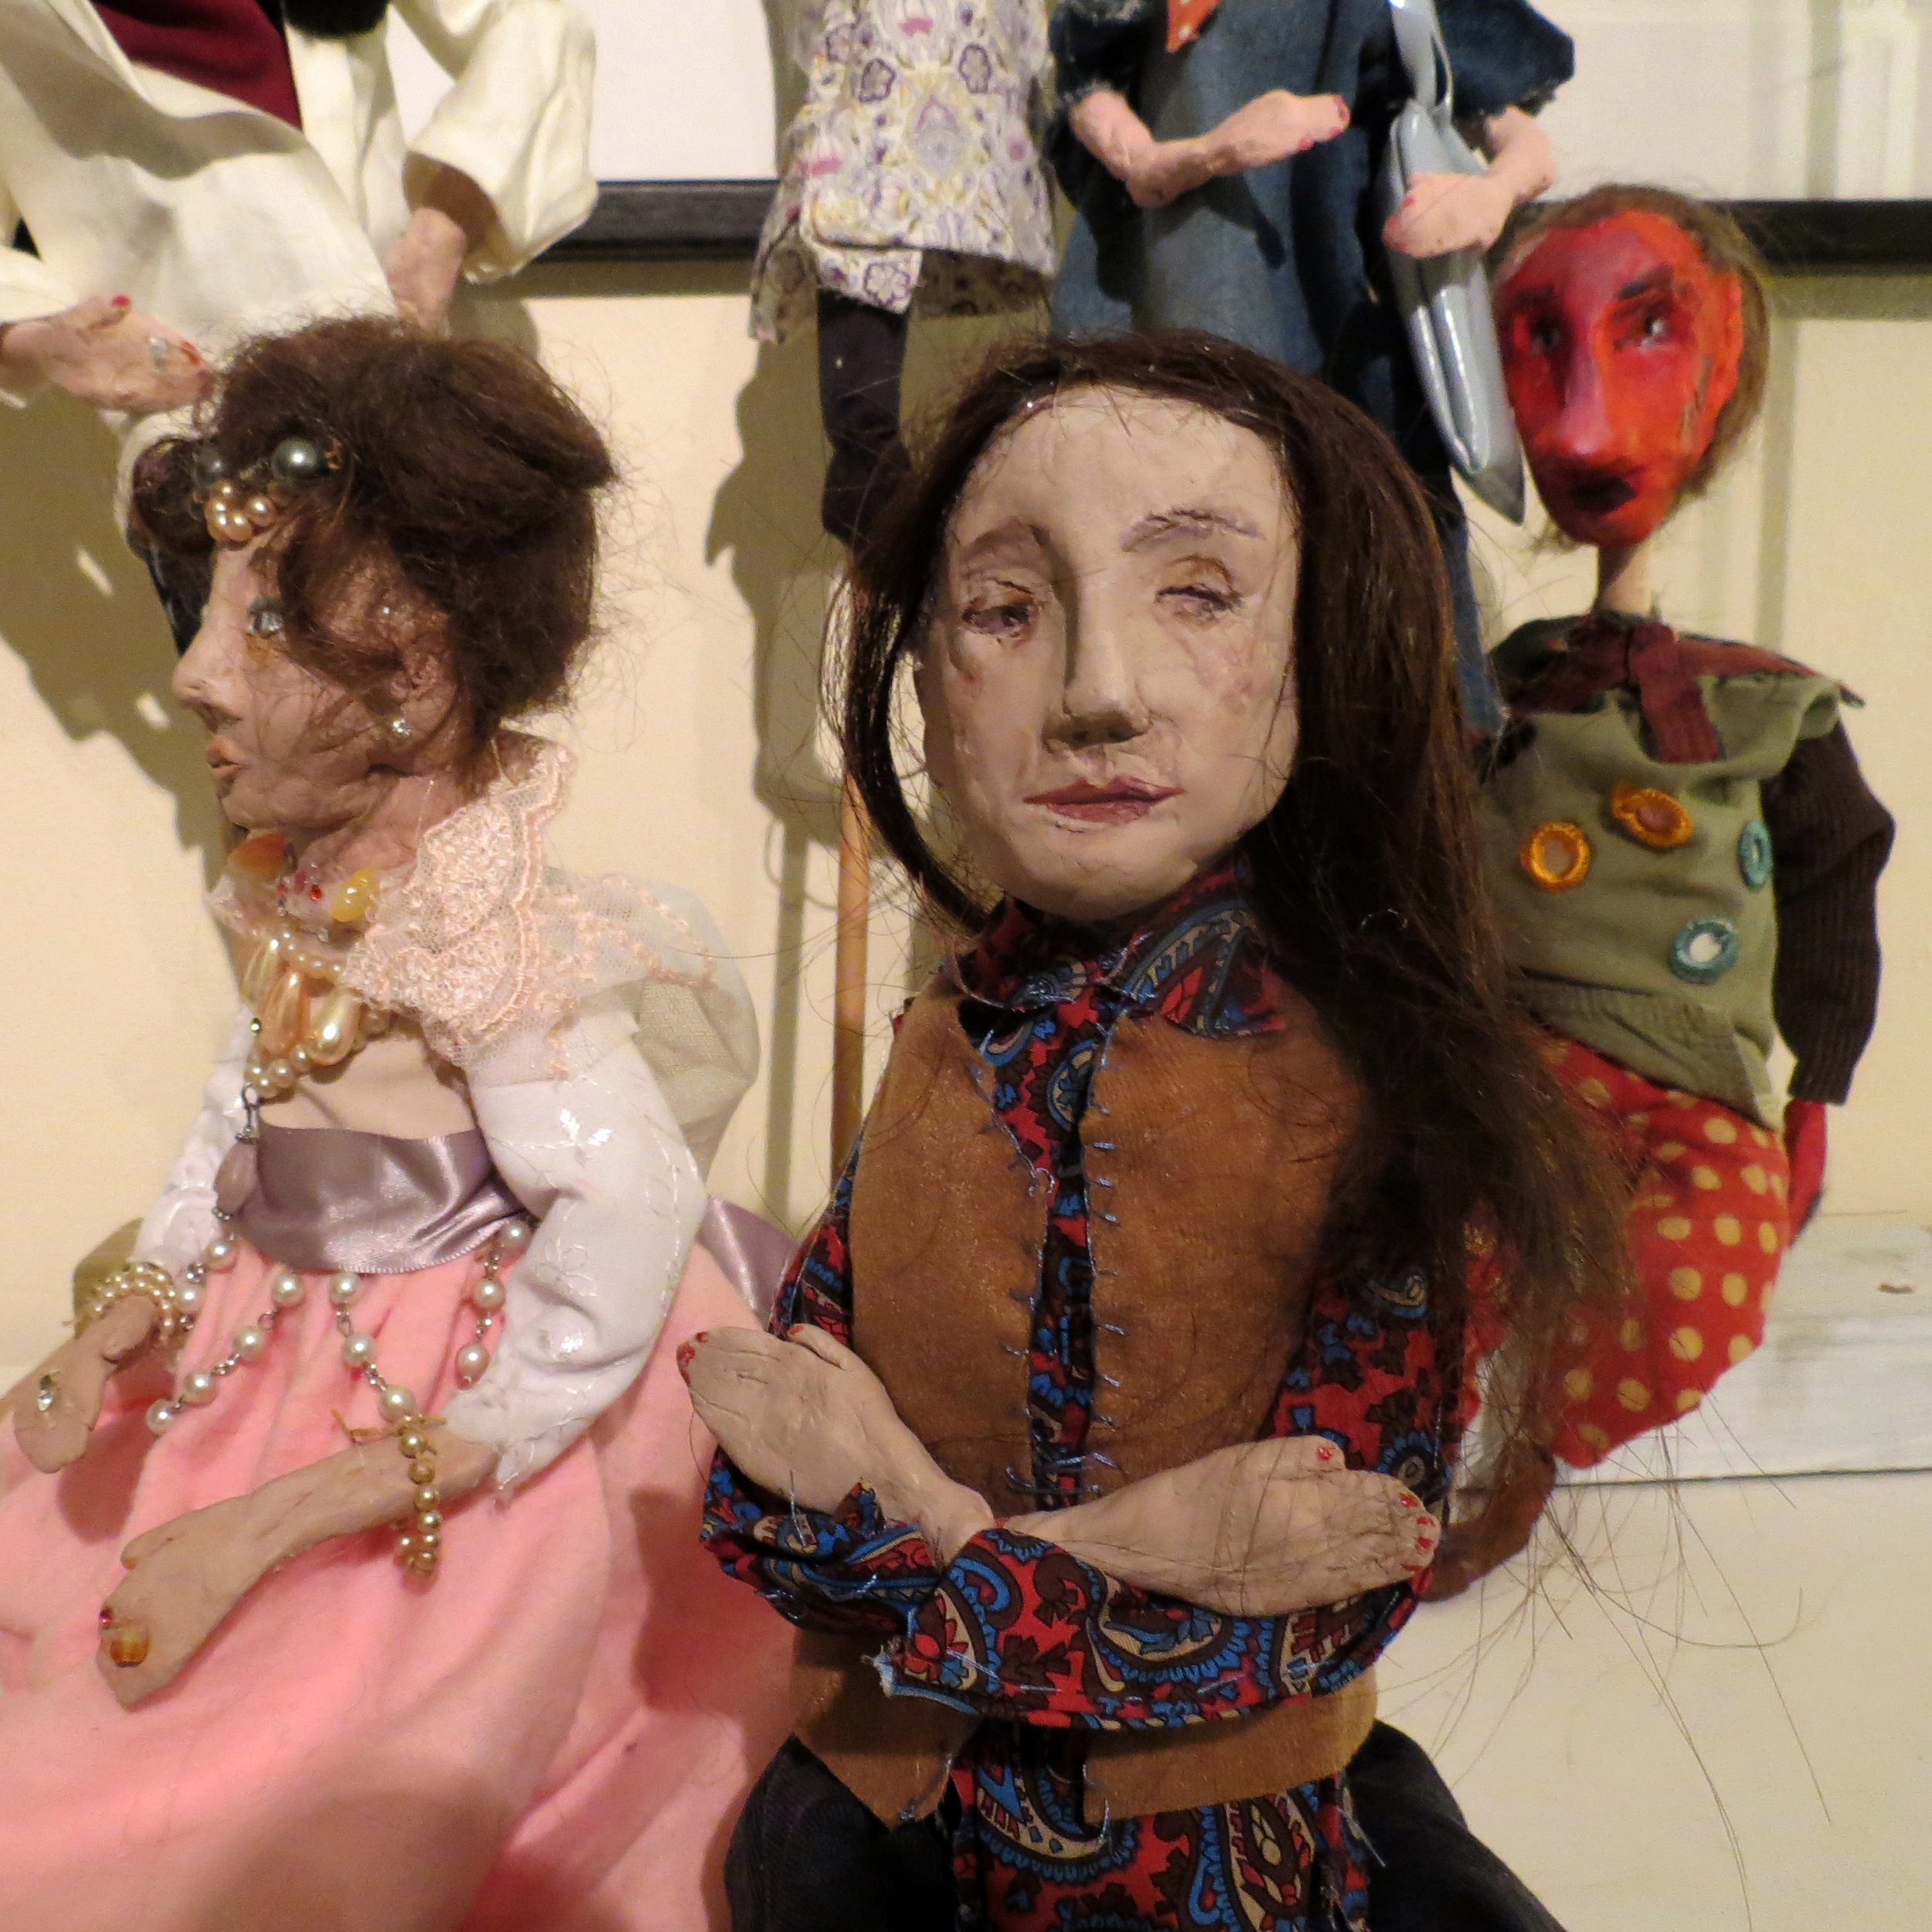 'Princess' and 'Art Mum' Puppets